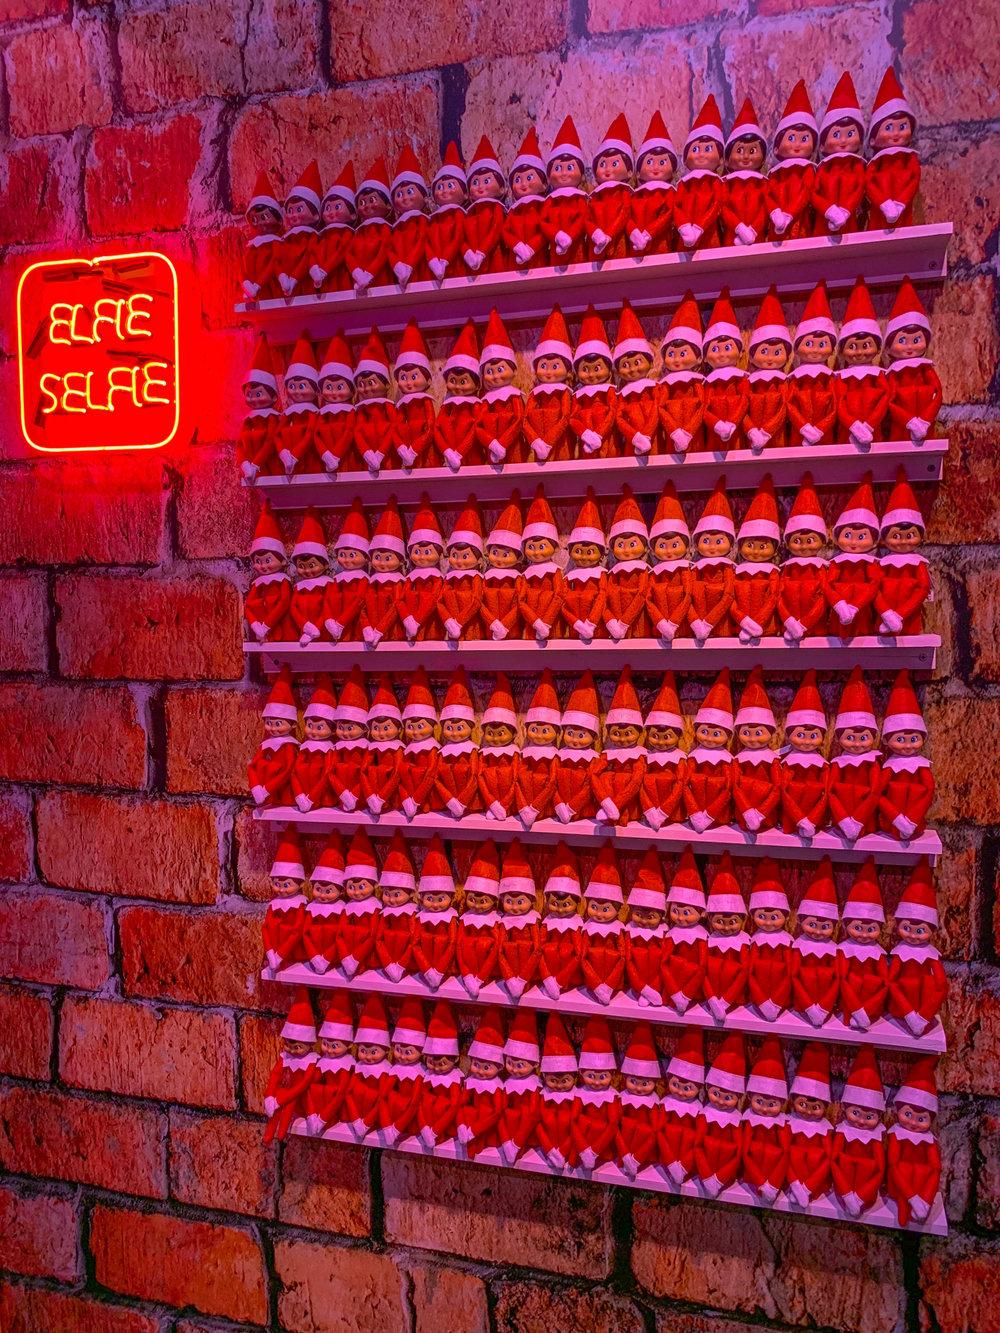 Fa La Land Pop Up Los Angeles elf on a shelf - elfie selfie